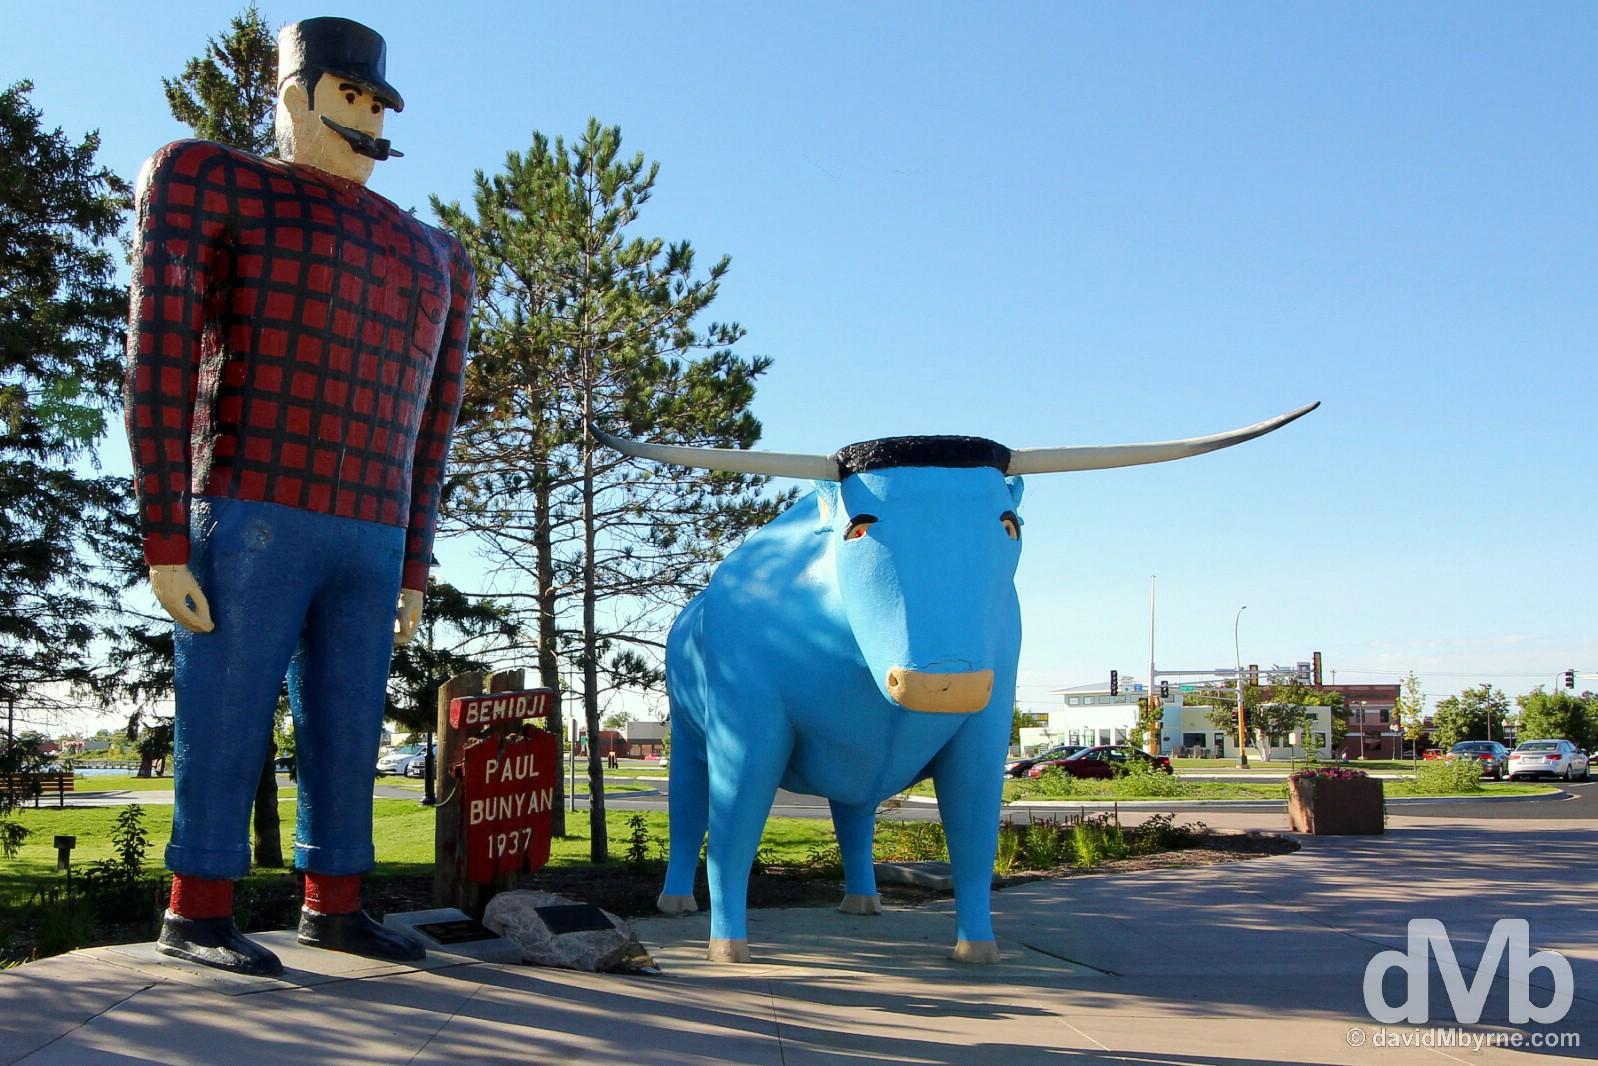 The Paul Bunyan & Babe the Blue Ox statue in Paul Bunyam Park on the shores of Lake Bemidji, Bemidji, northern Minnesota, USA. August 31, 2016.